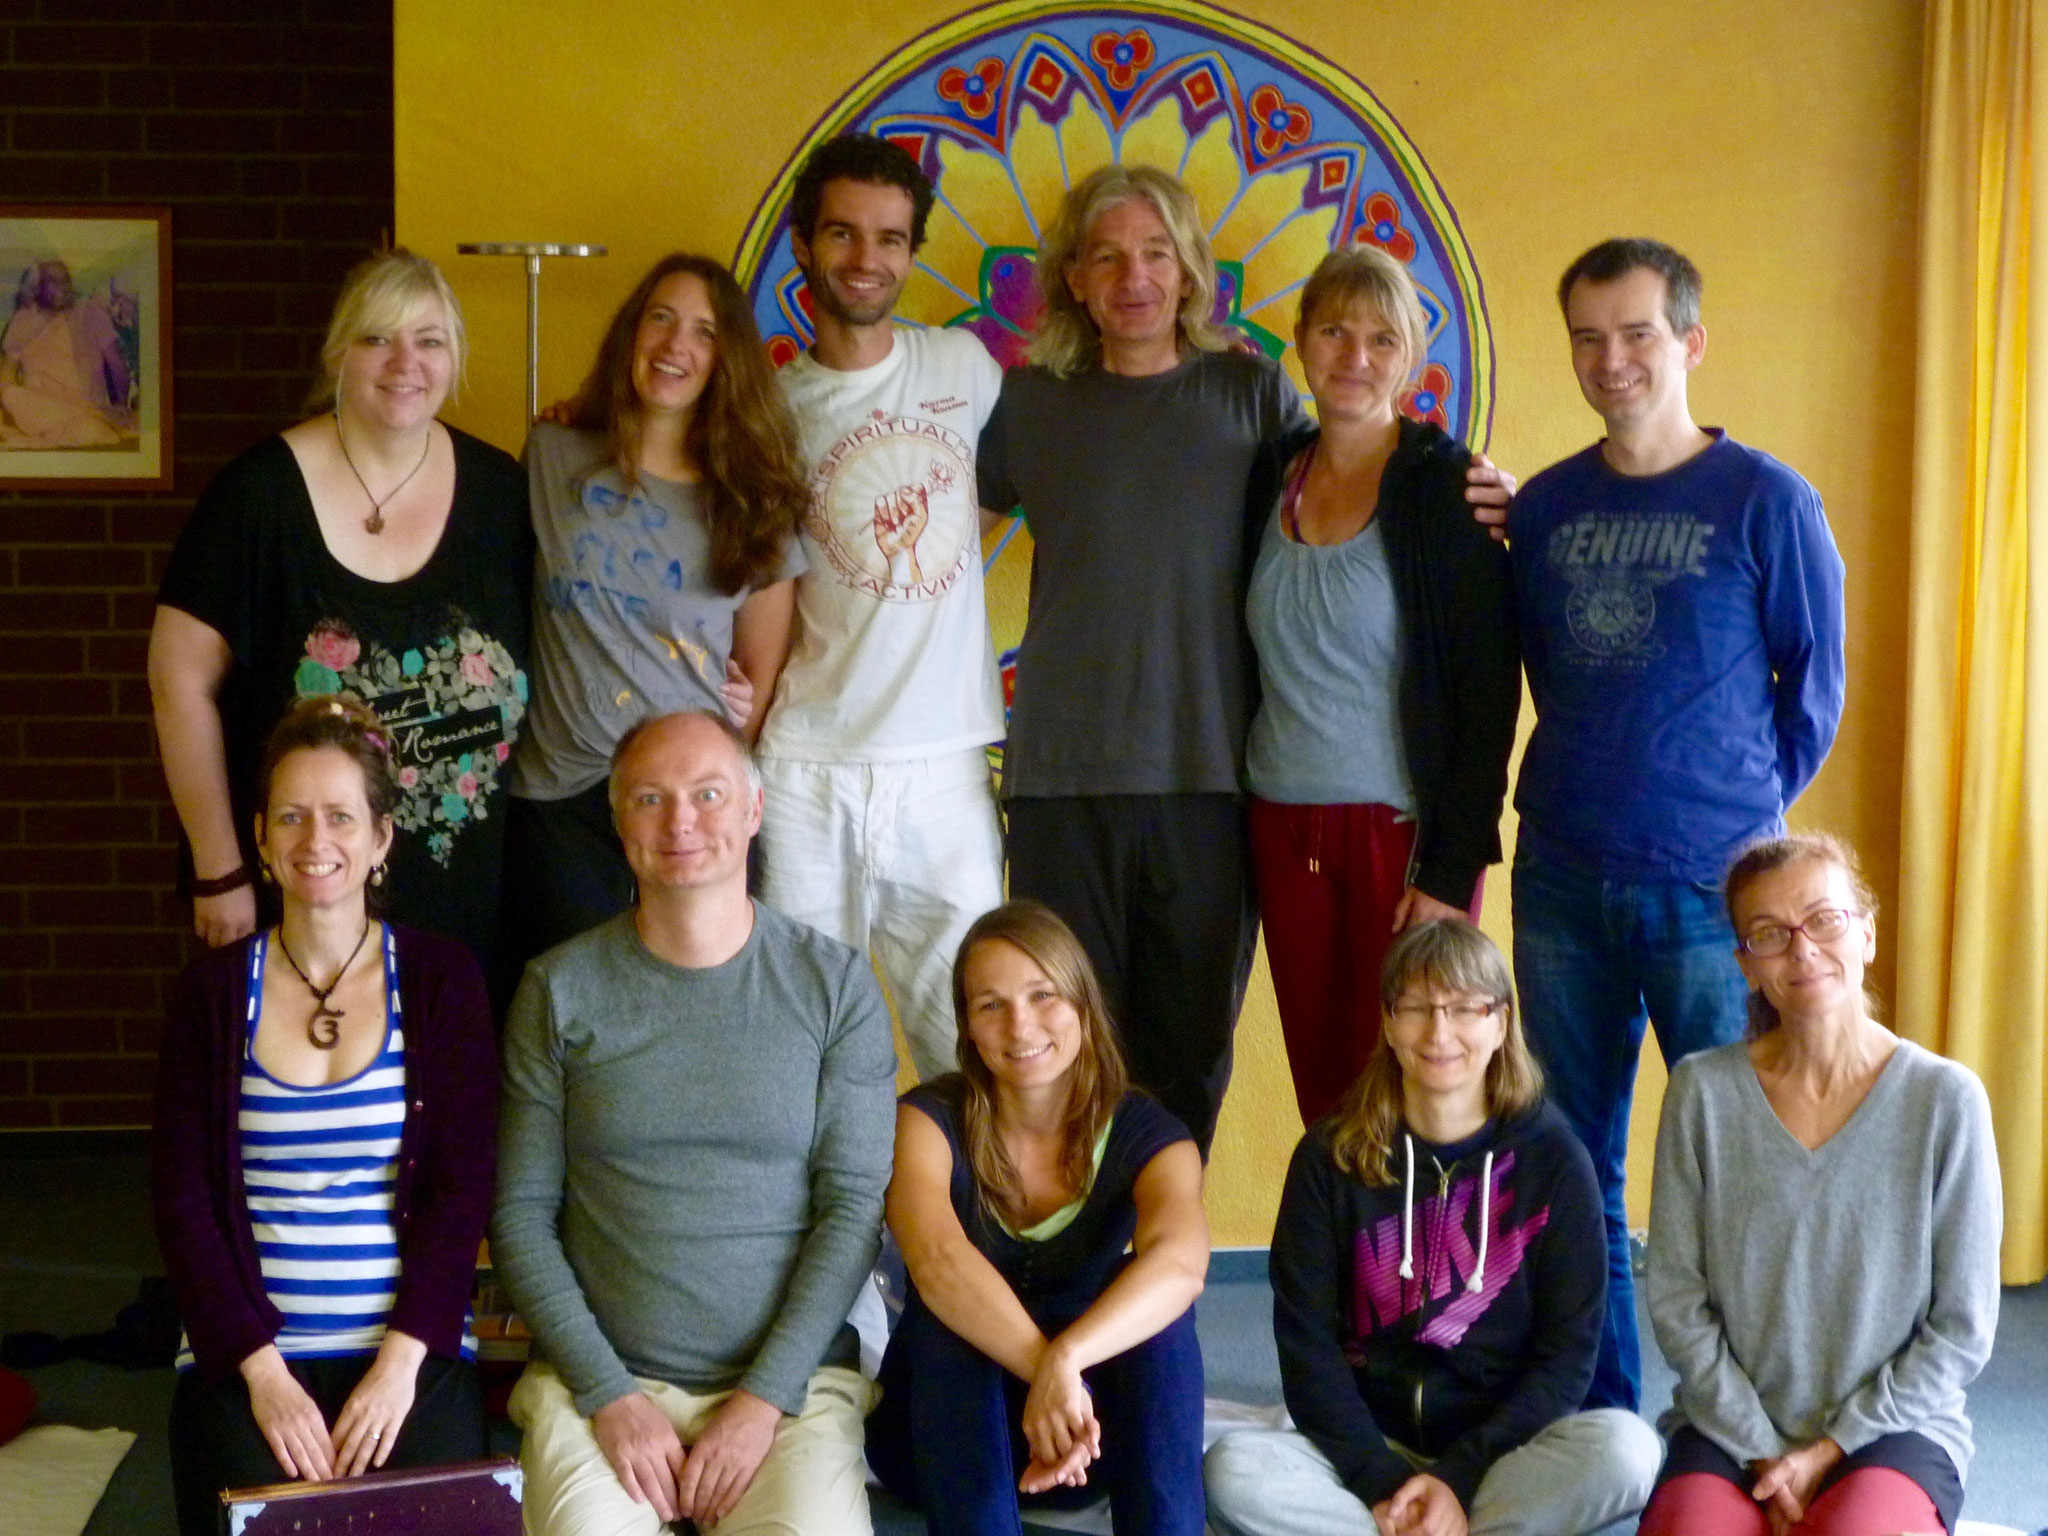 meine Kirtan&Harmonium- Ferienwochengruppe 2016, Yoga Vidya Bad Meinberg